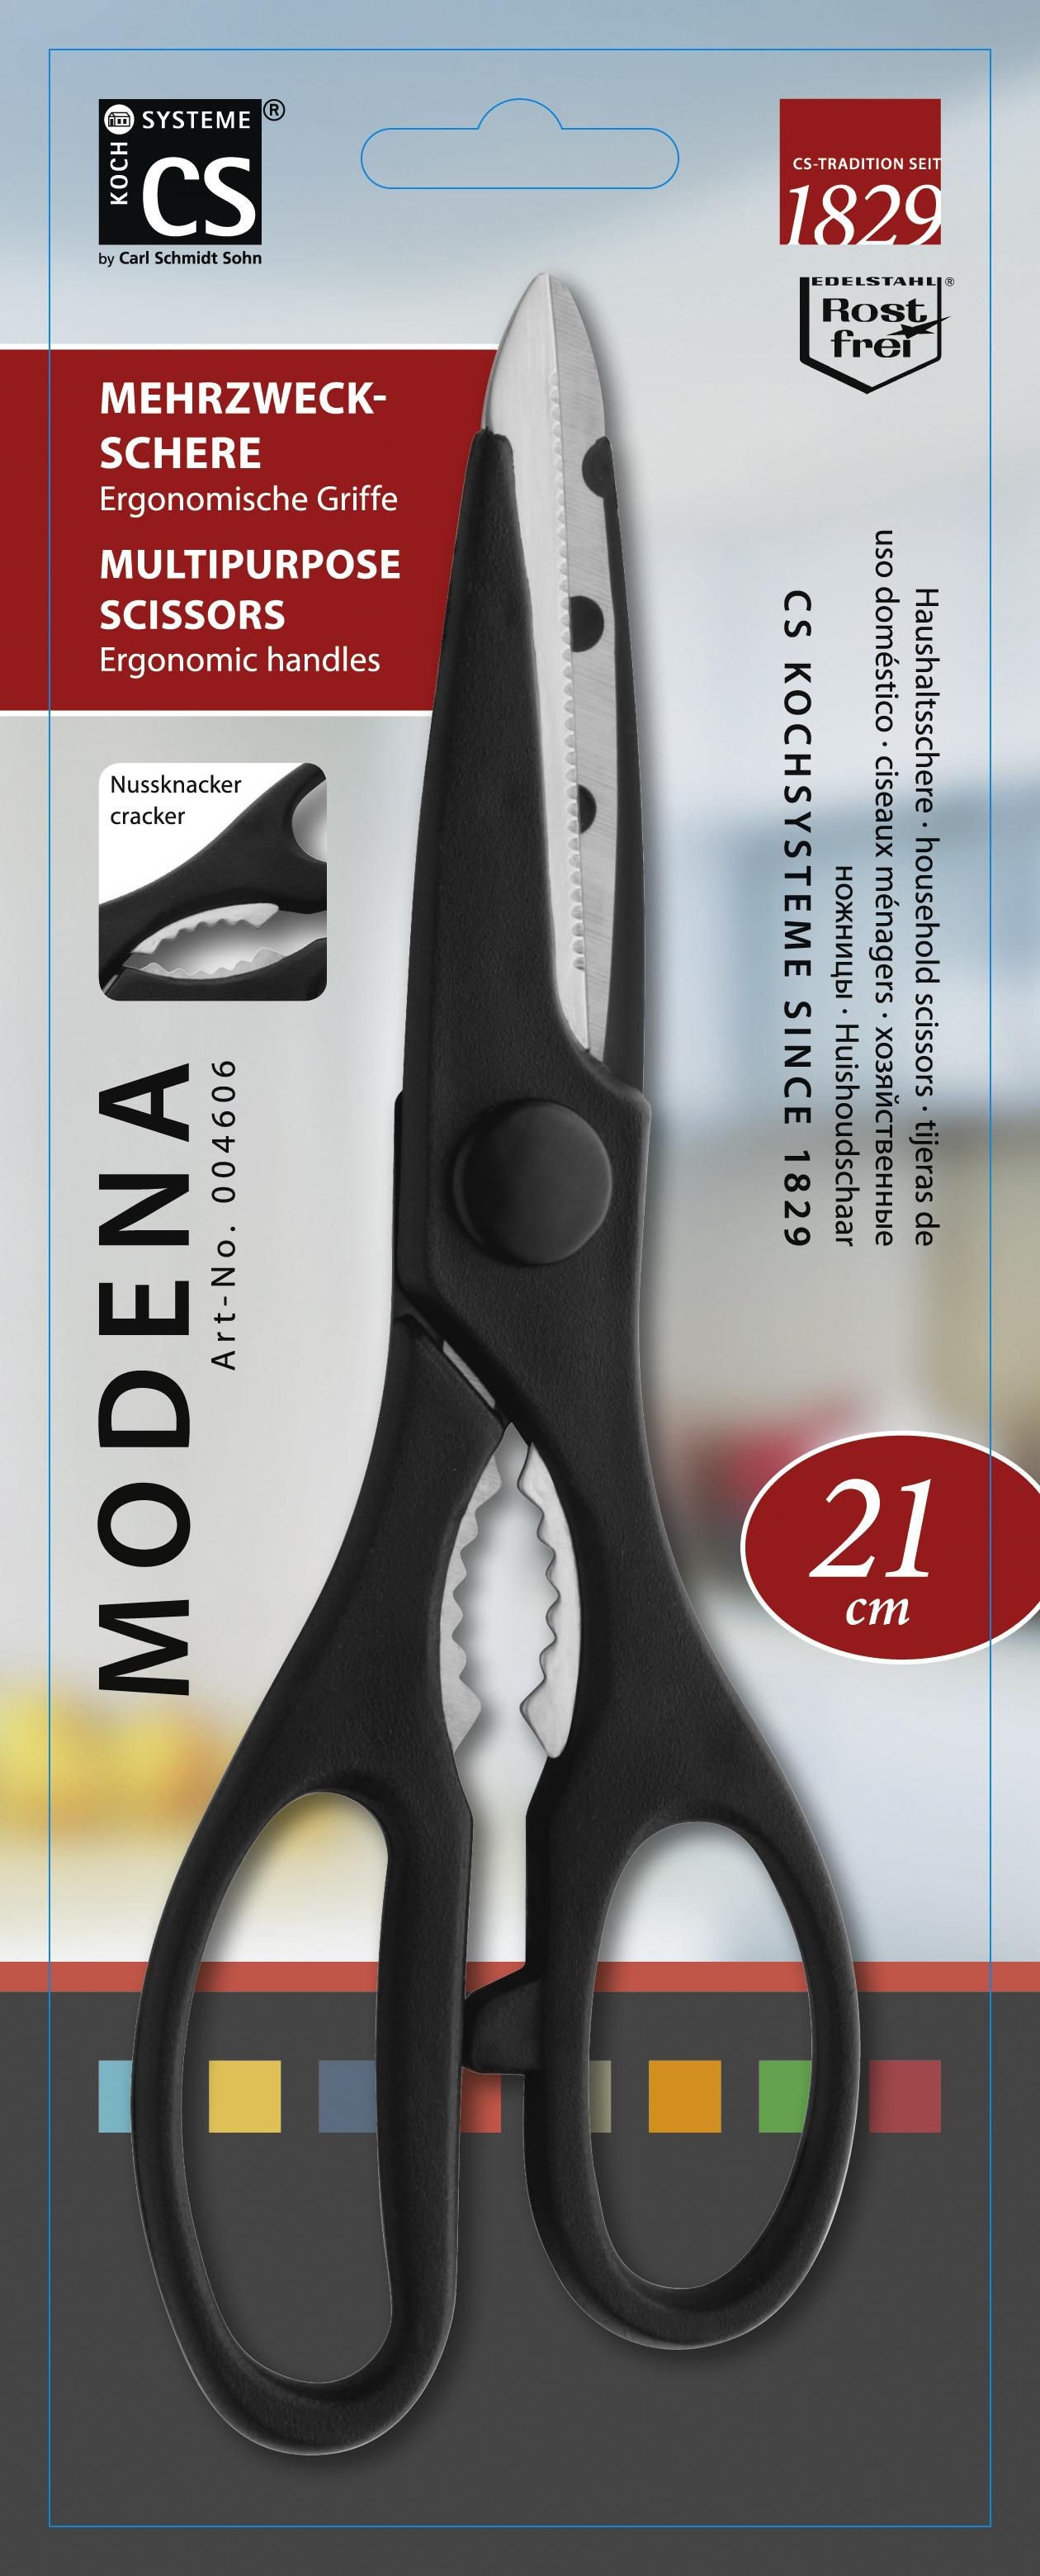 Ножницы кухонные CS-KOCHSYSTEME Modena, CS004606, Нержавеющая сталь